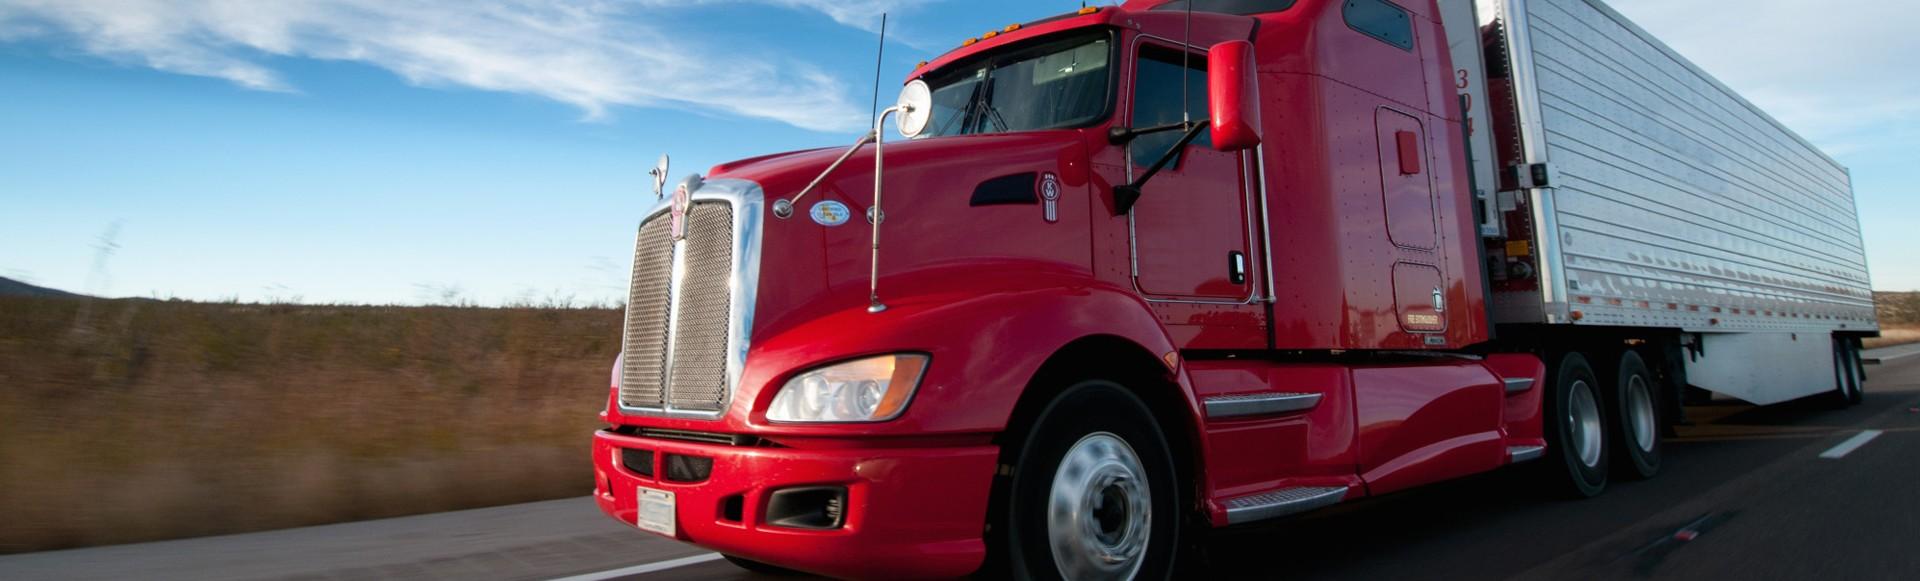 America 1 Logistics   Trucking Companies in Savannah GA